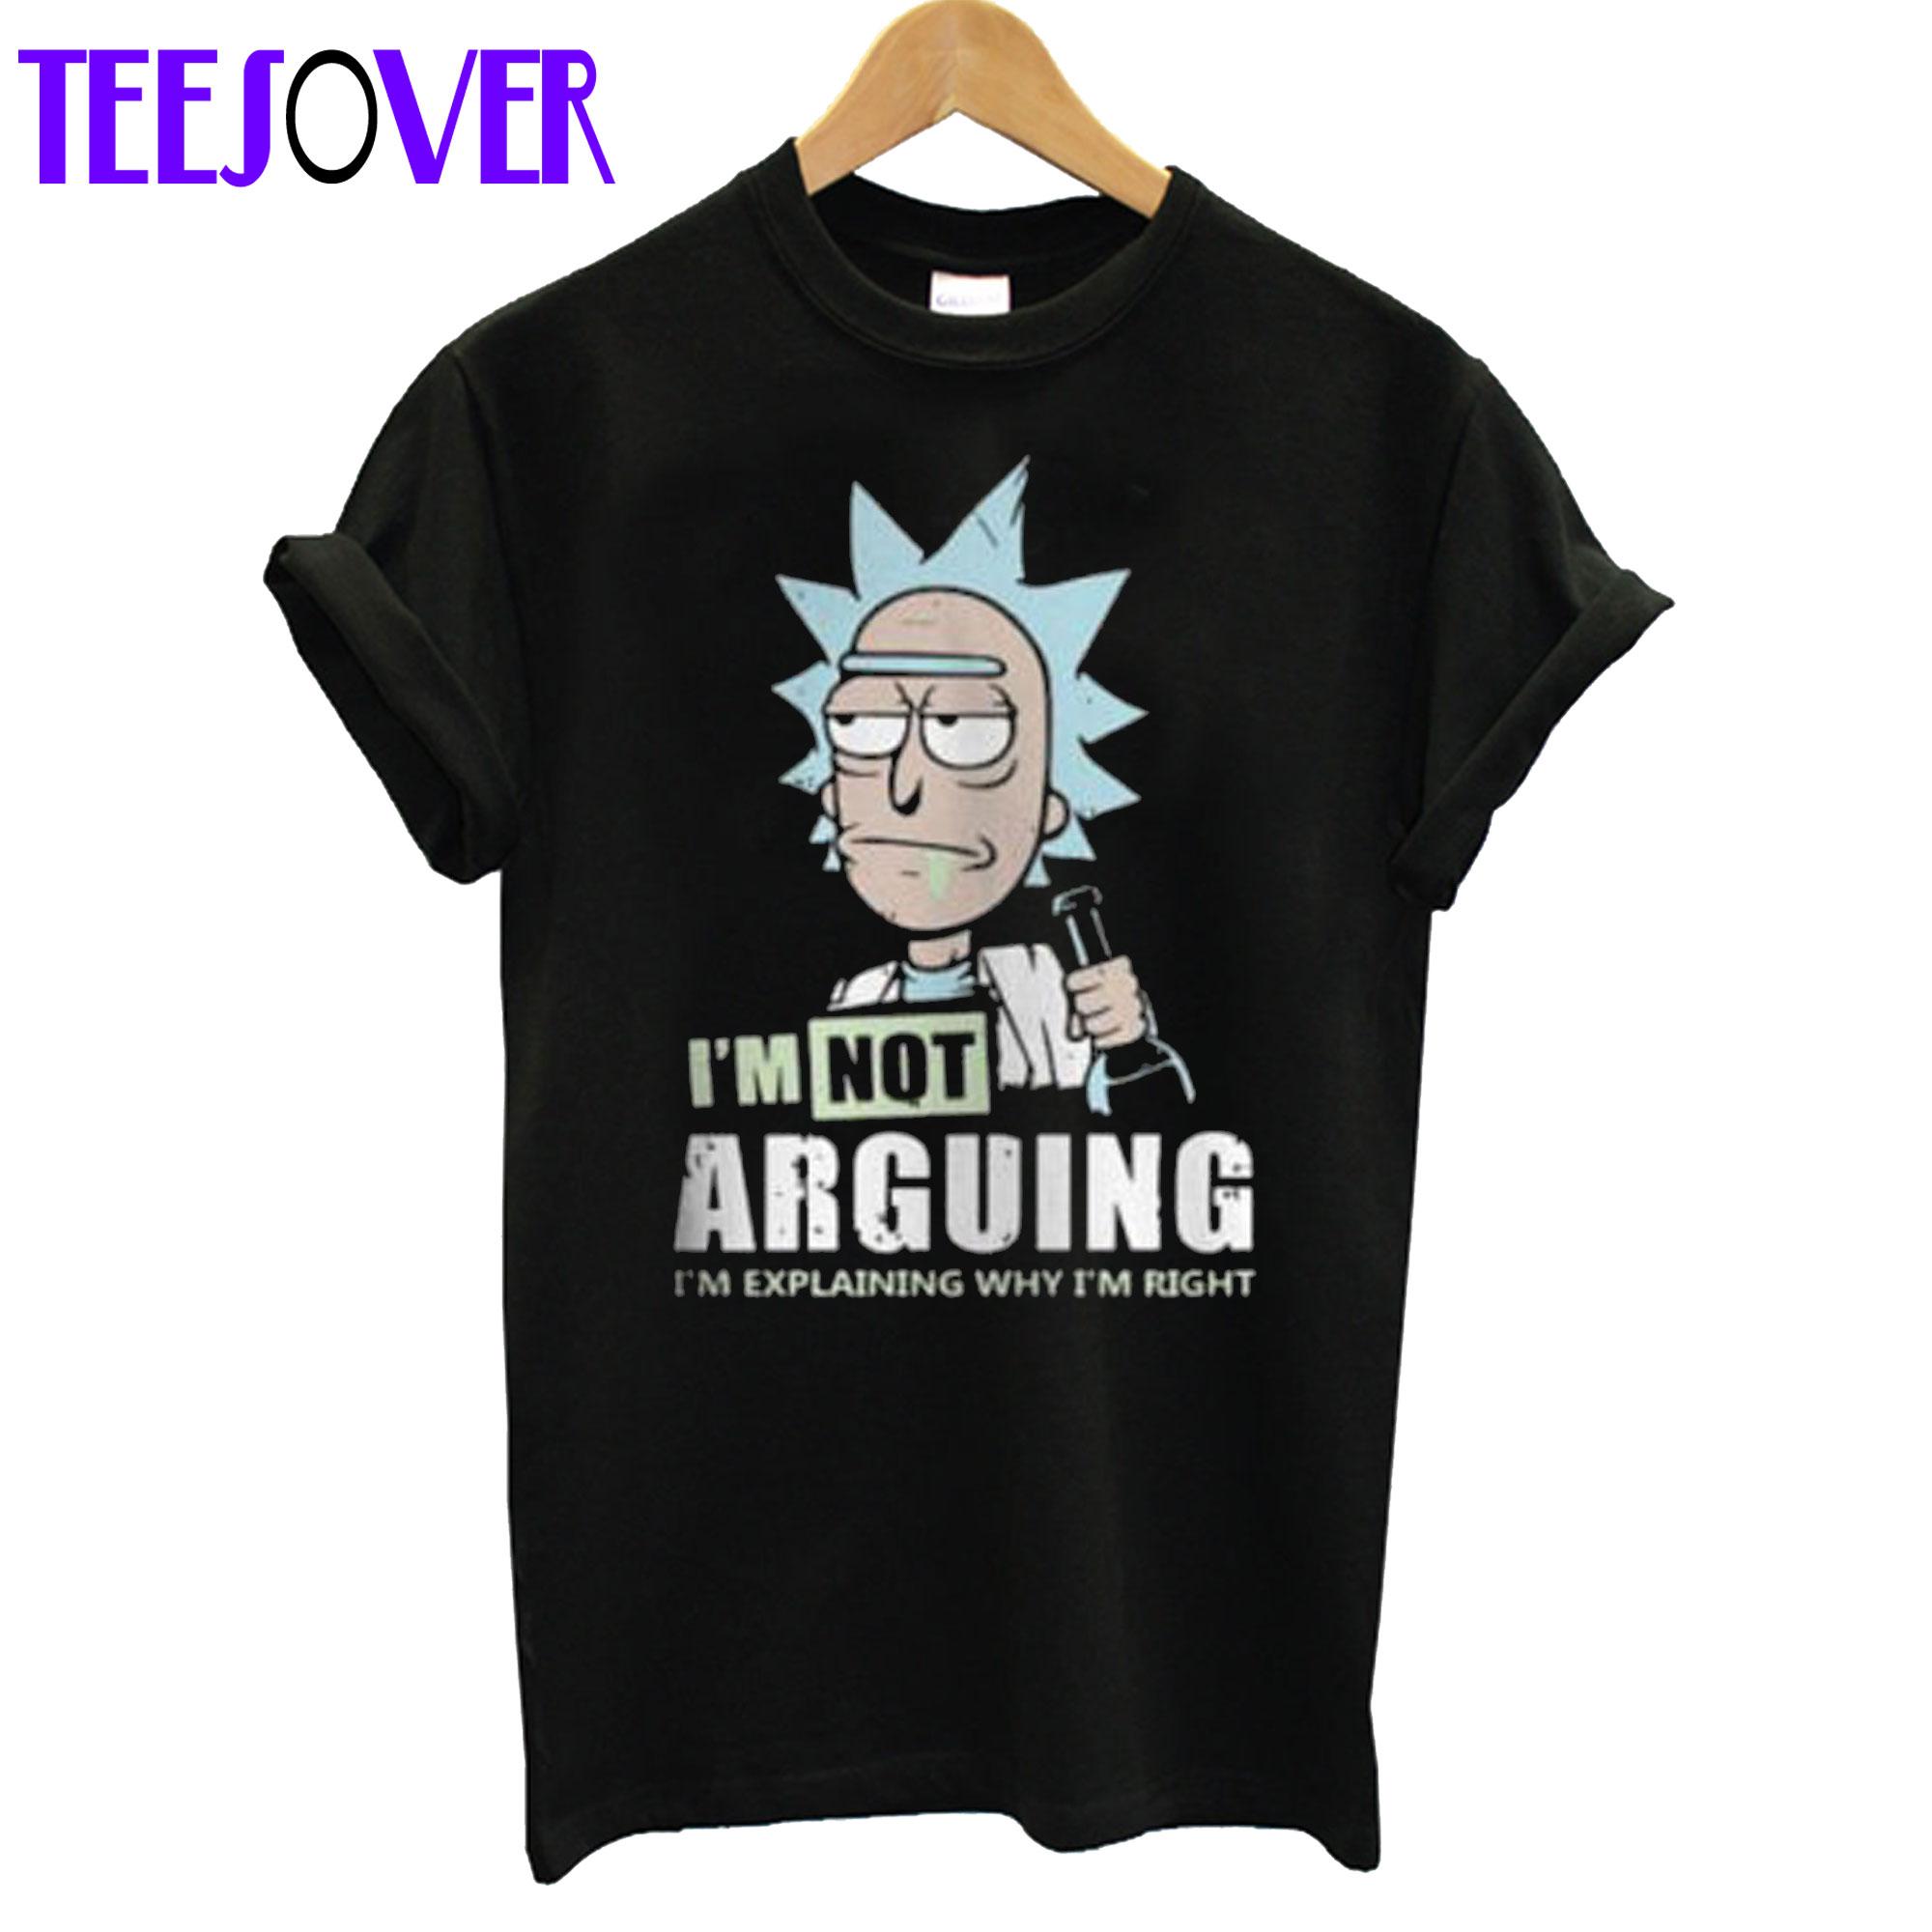 Rick & Morty TShirt I'm Not Arguing Men's T-Shirt